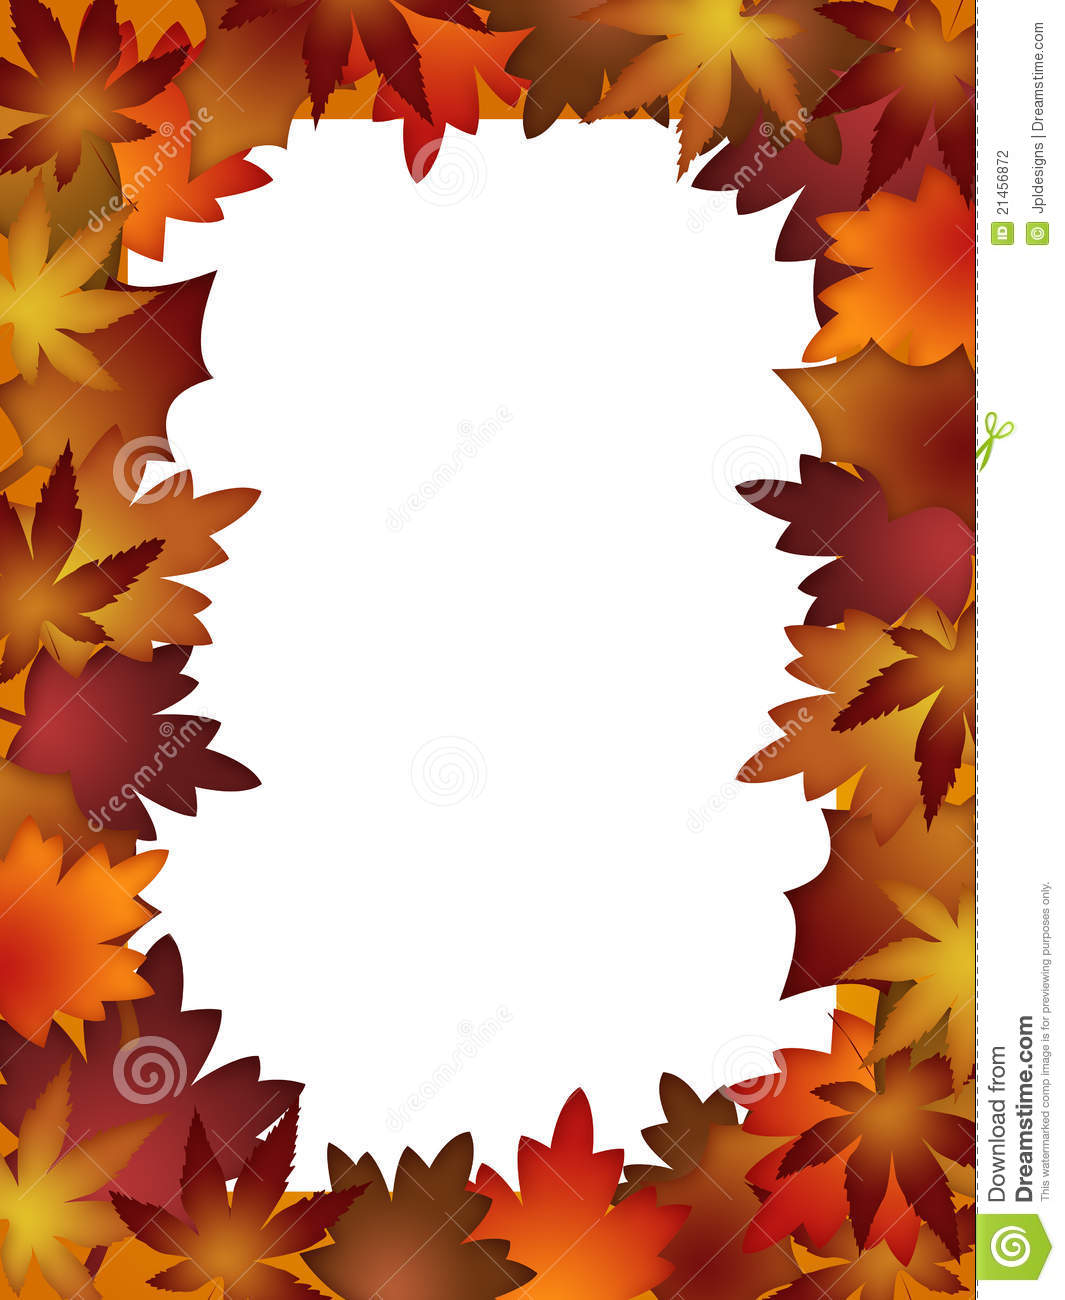 Printable autumn leaves border